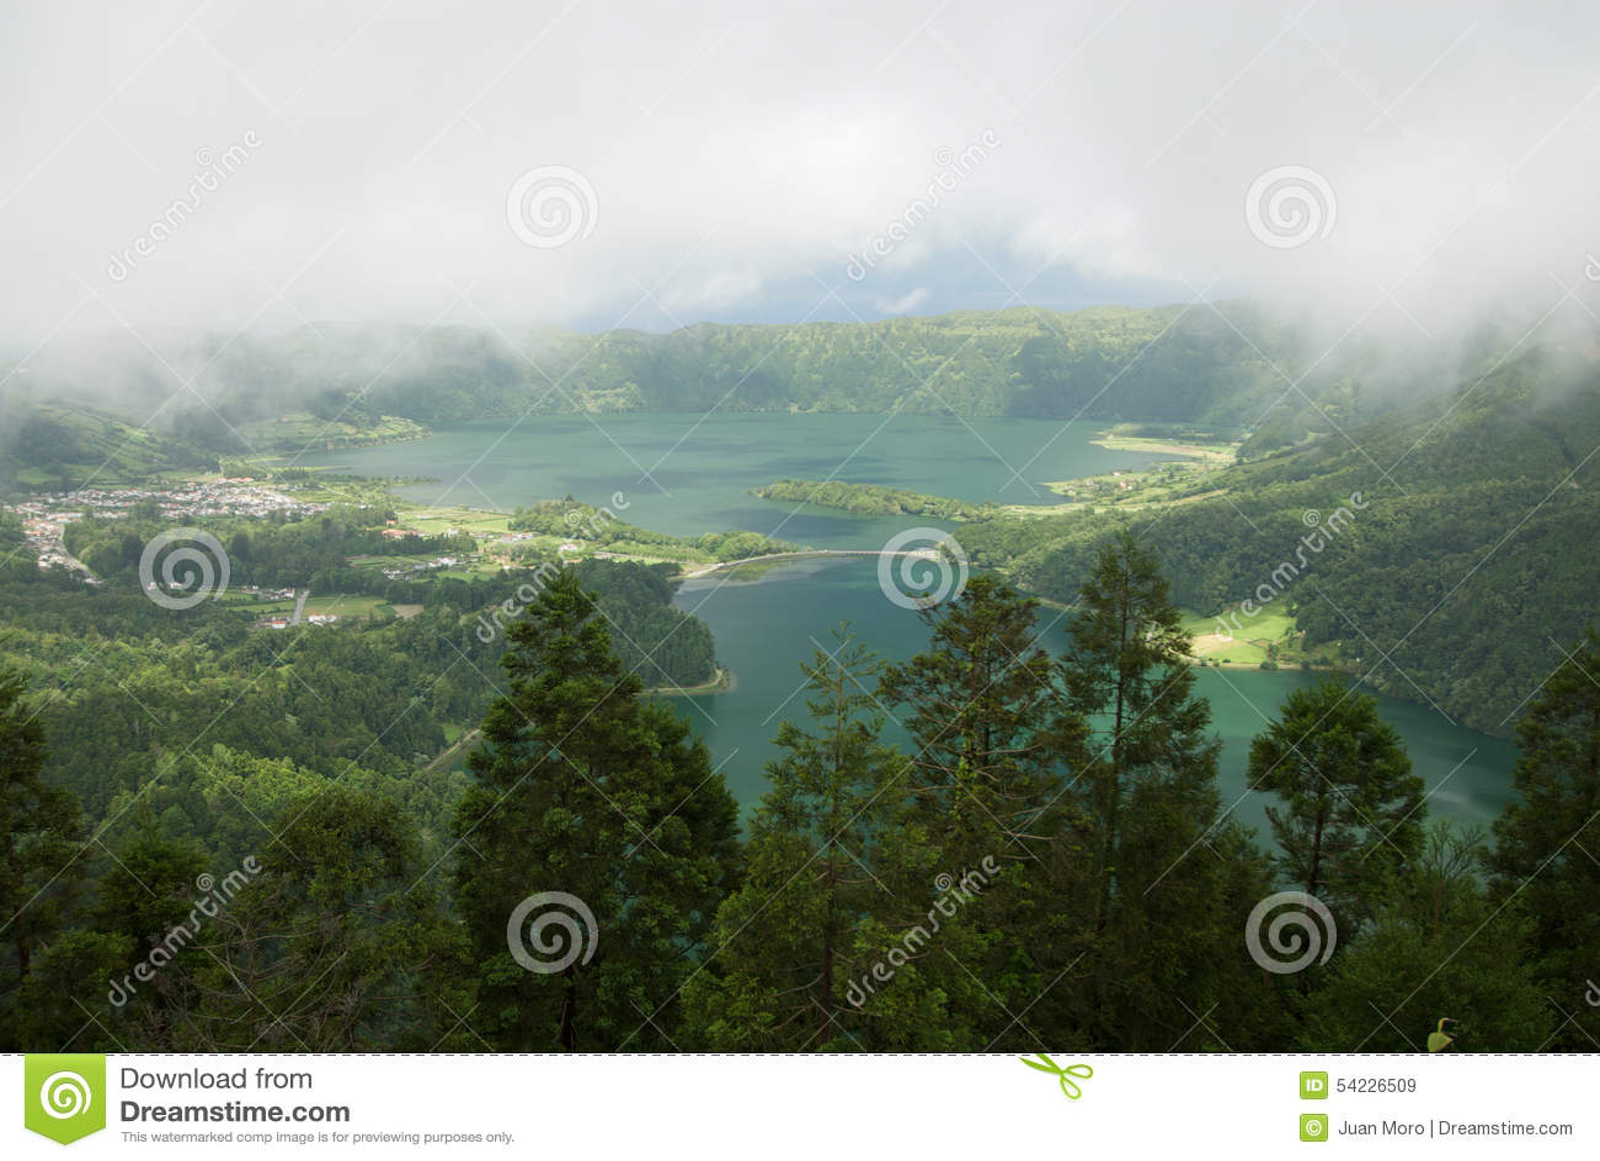 Scenic view under the clouds of Lagoa das Sete Cidades, Azores